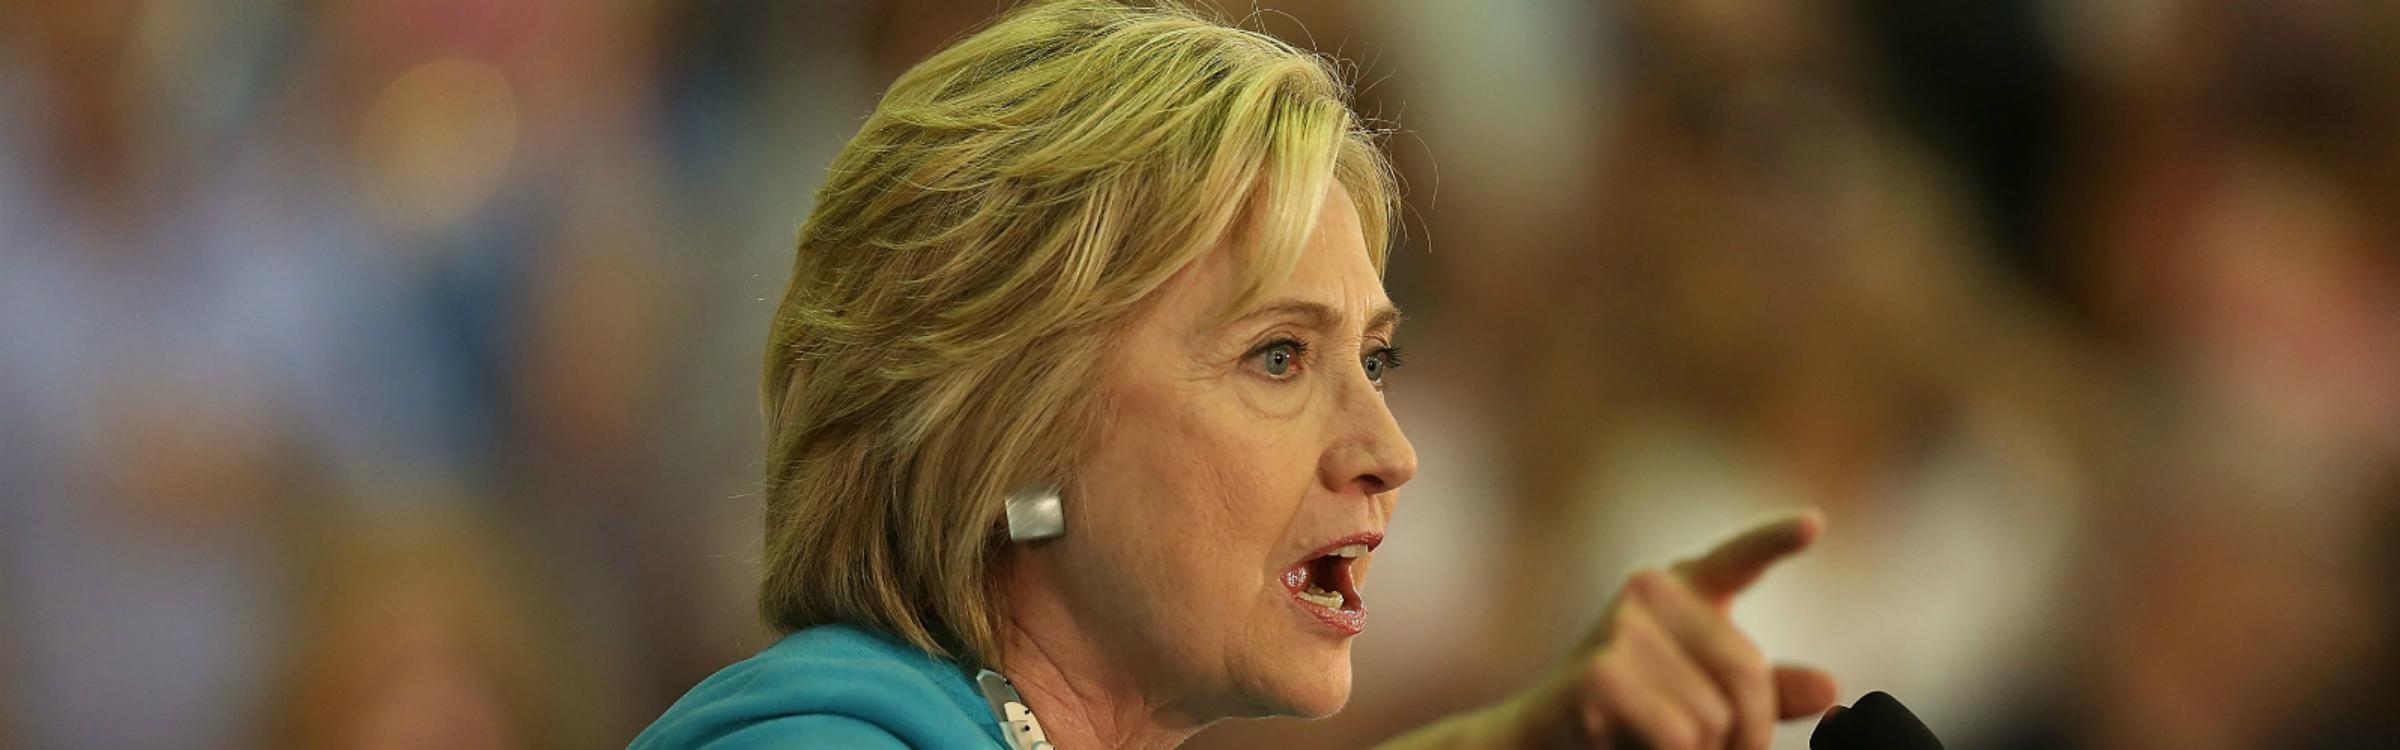 Hillary clinton anp.jpg header